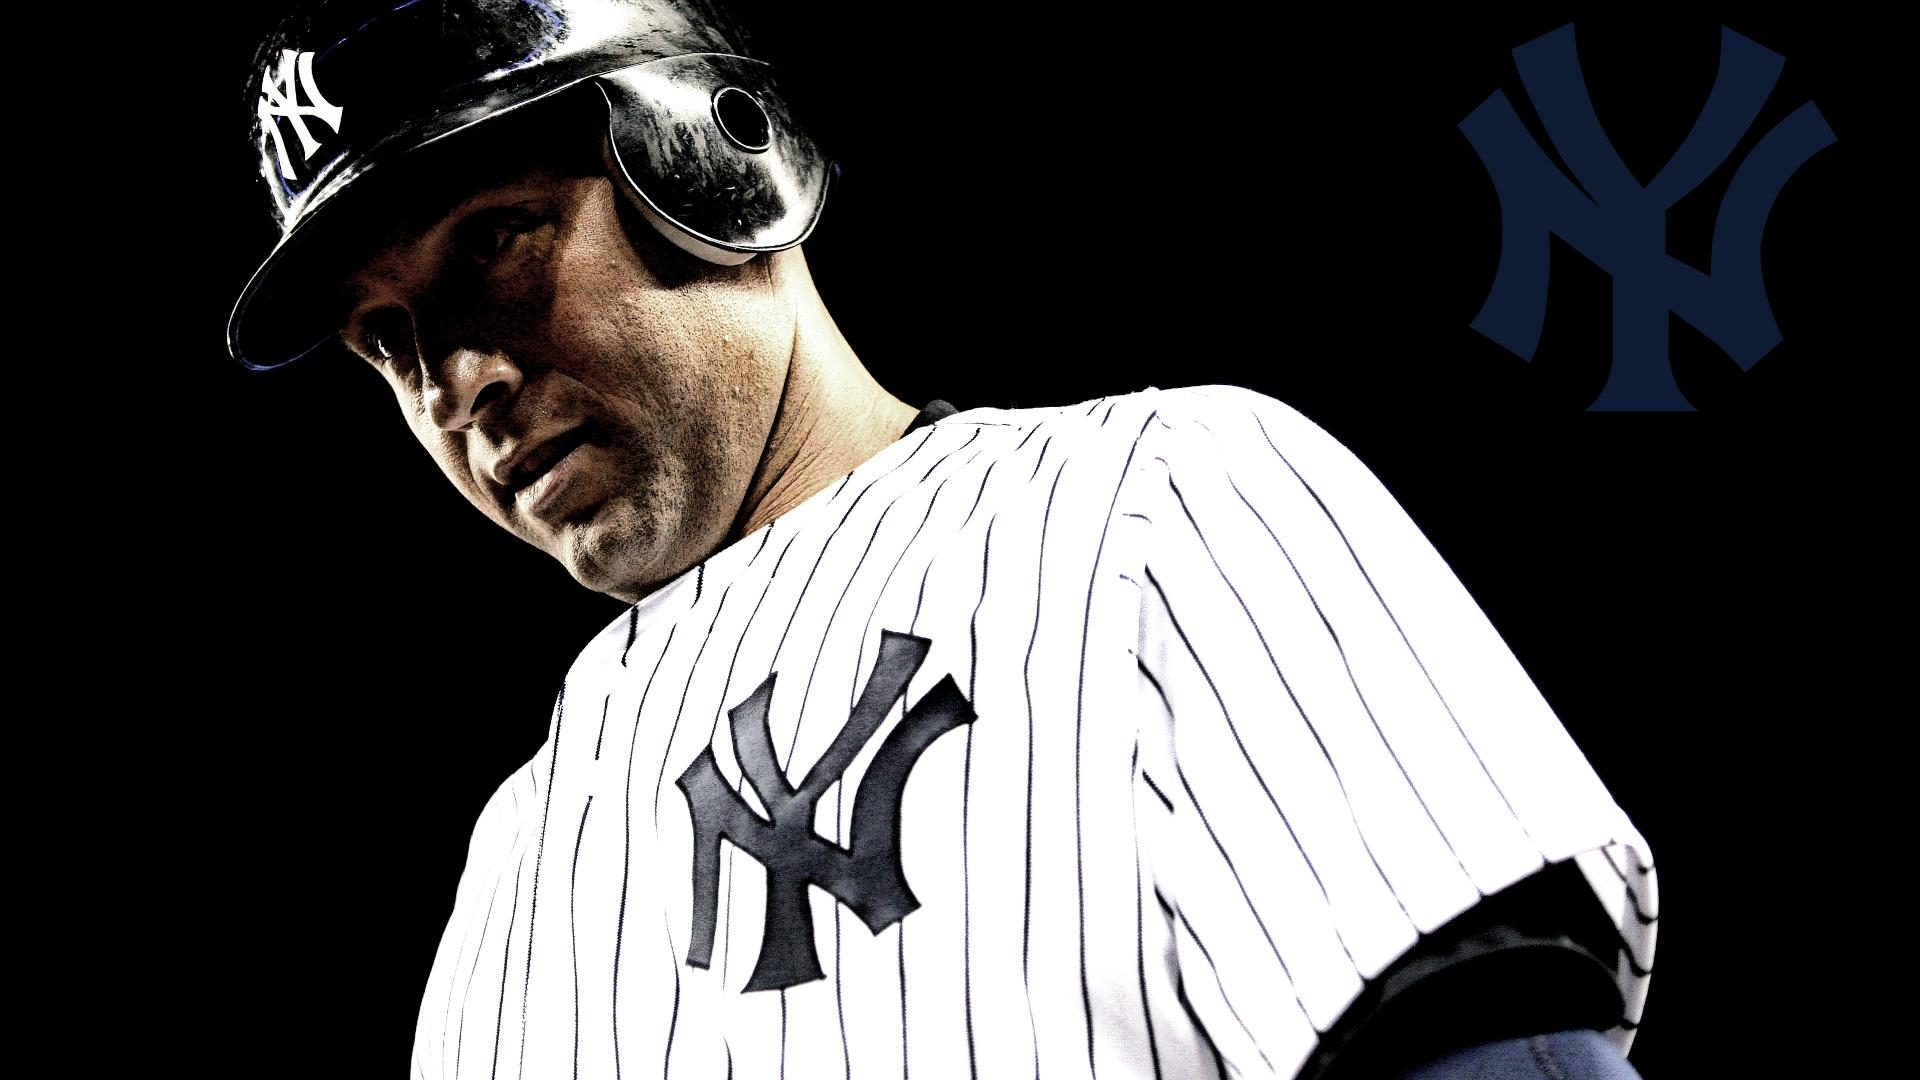 New York Yankees Derek Jeter New York Yankees Hd By - Derek Jeter Black Background , HD Wallpaper & Backgrounds